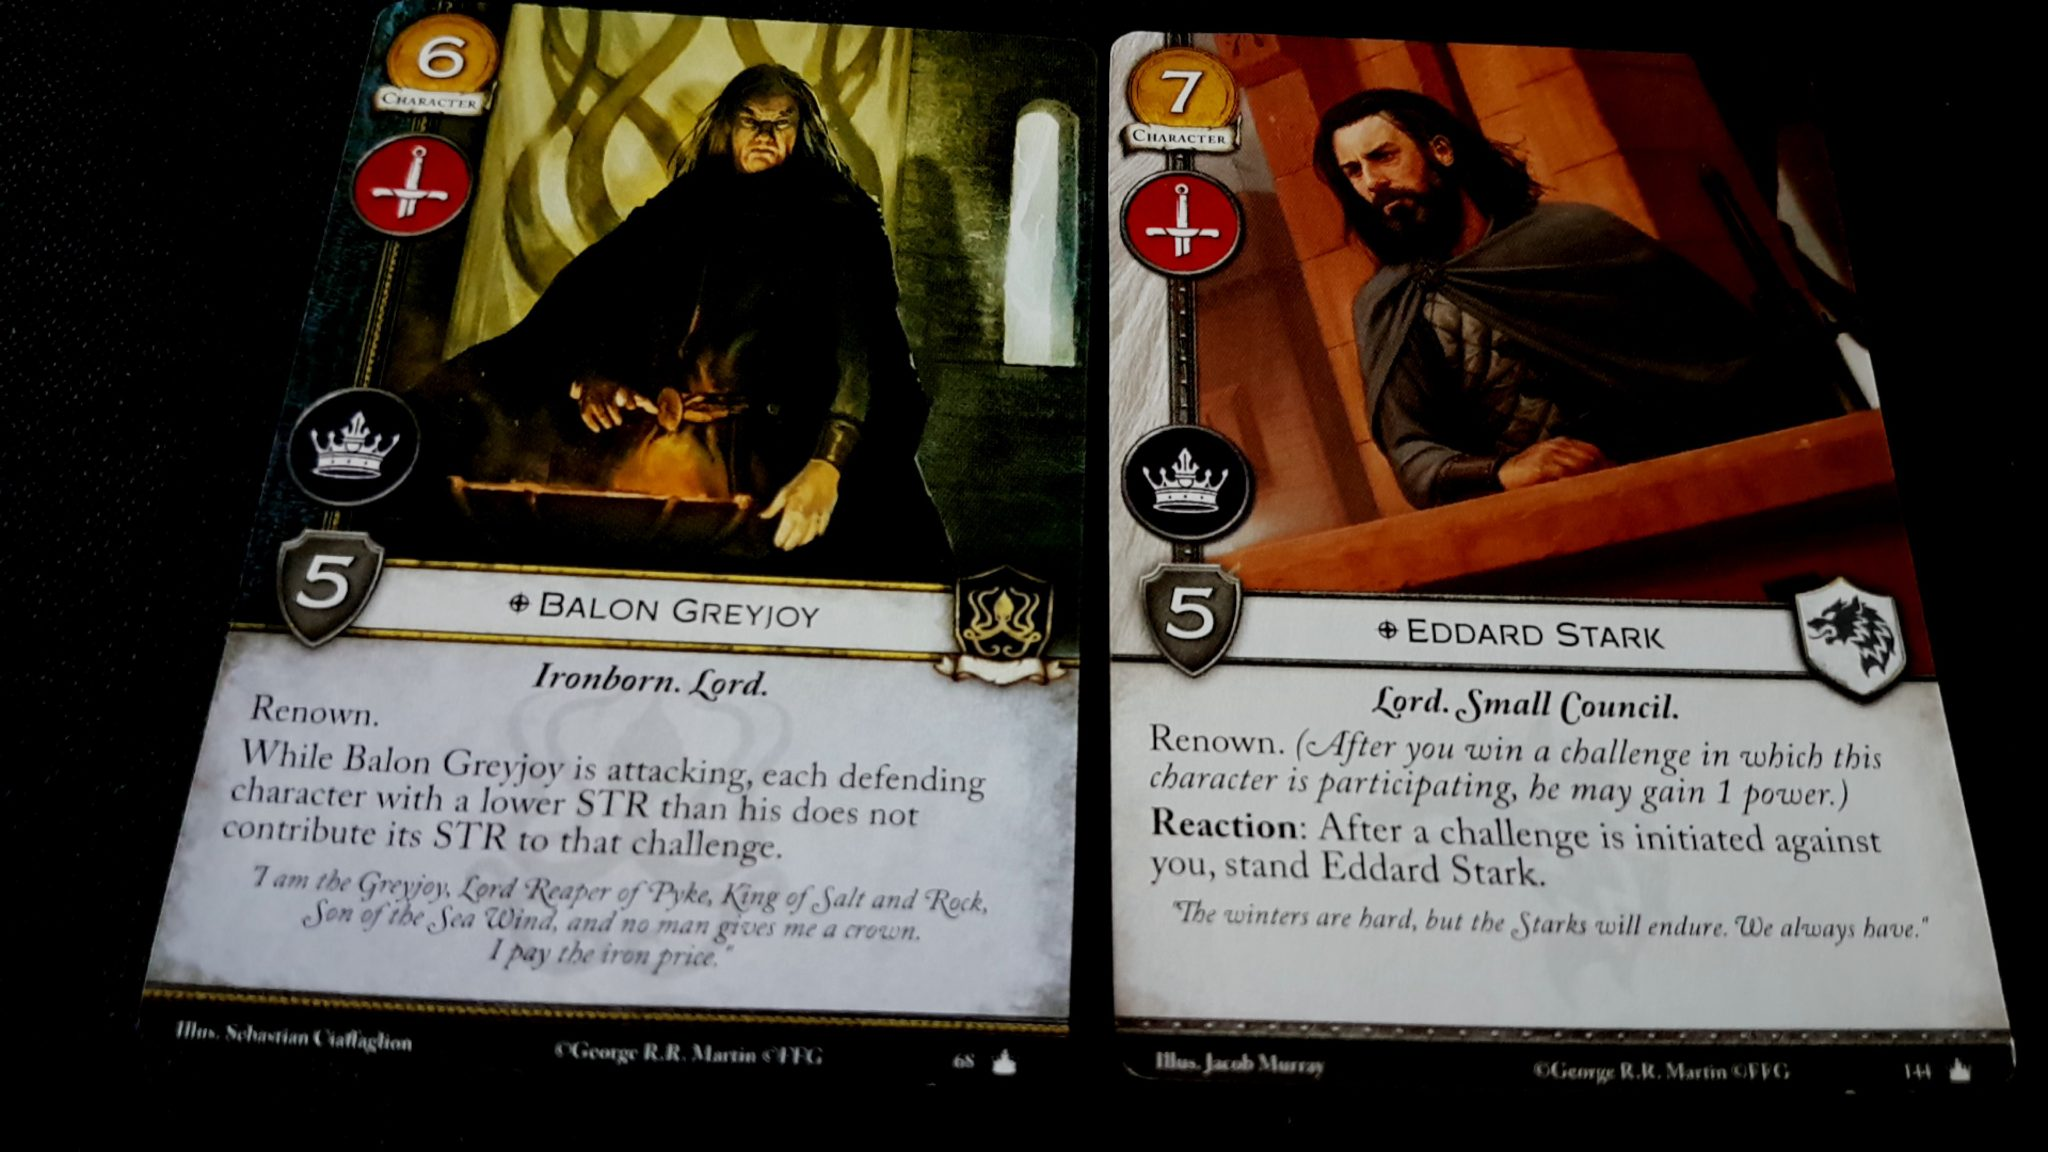 Eddard and Balon